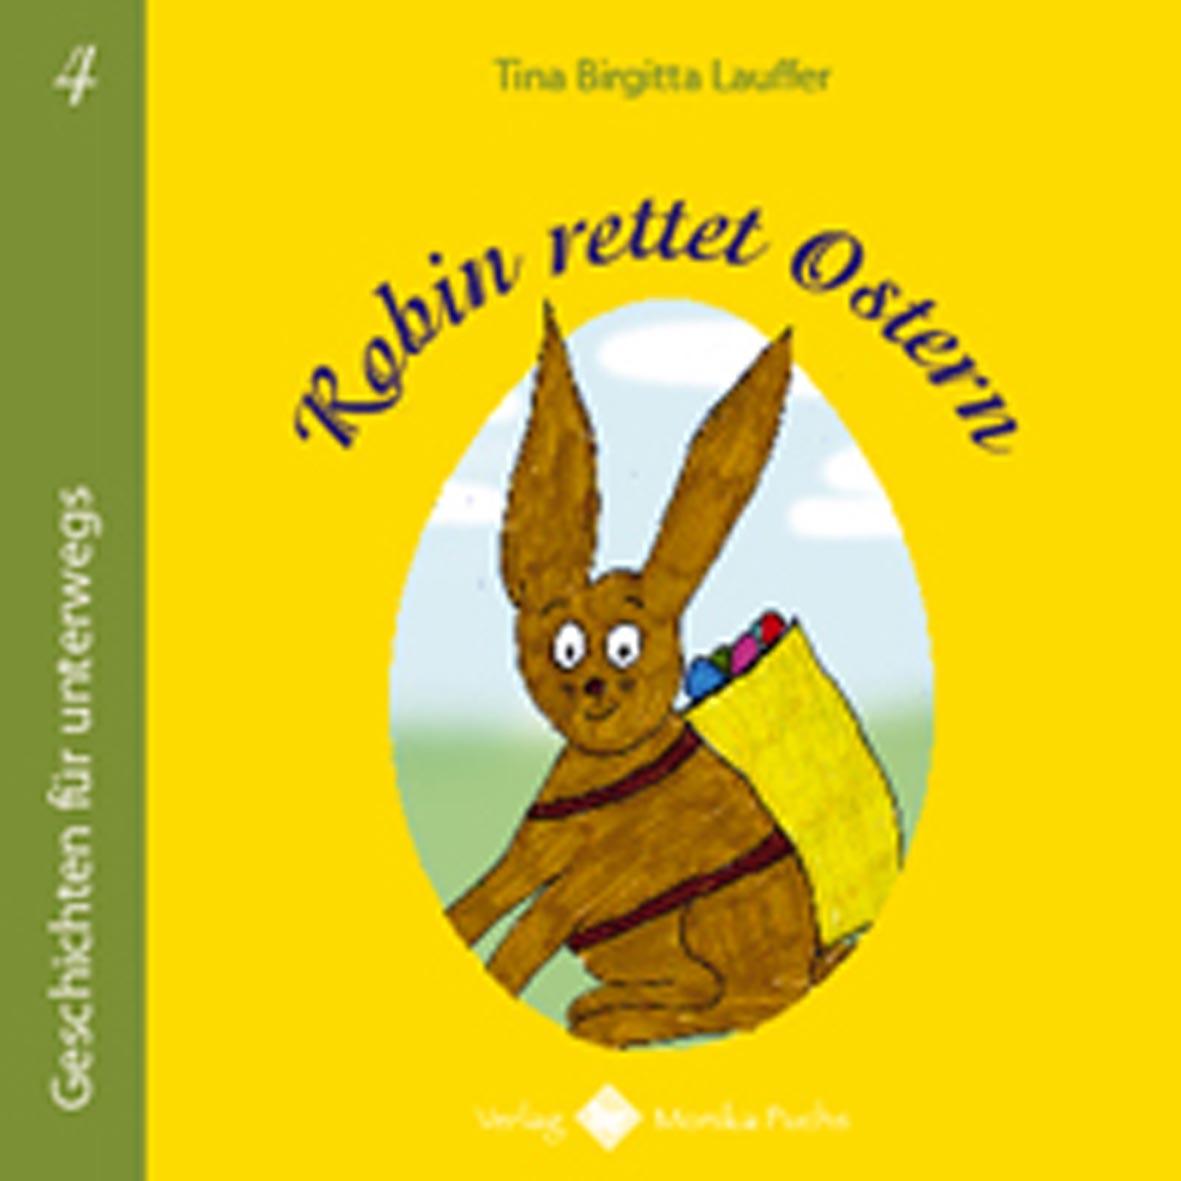 Tina Birgitta Lauffer - Robin rettet Ostern